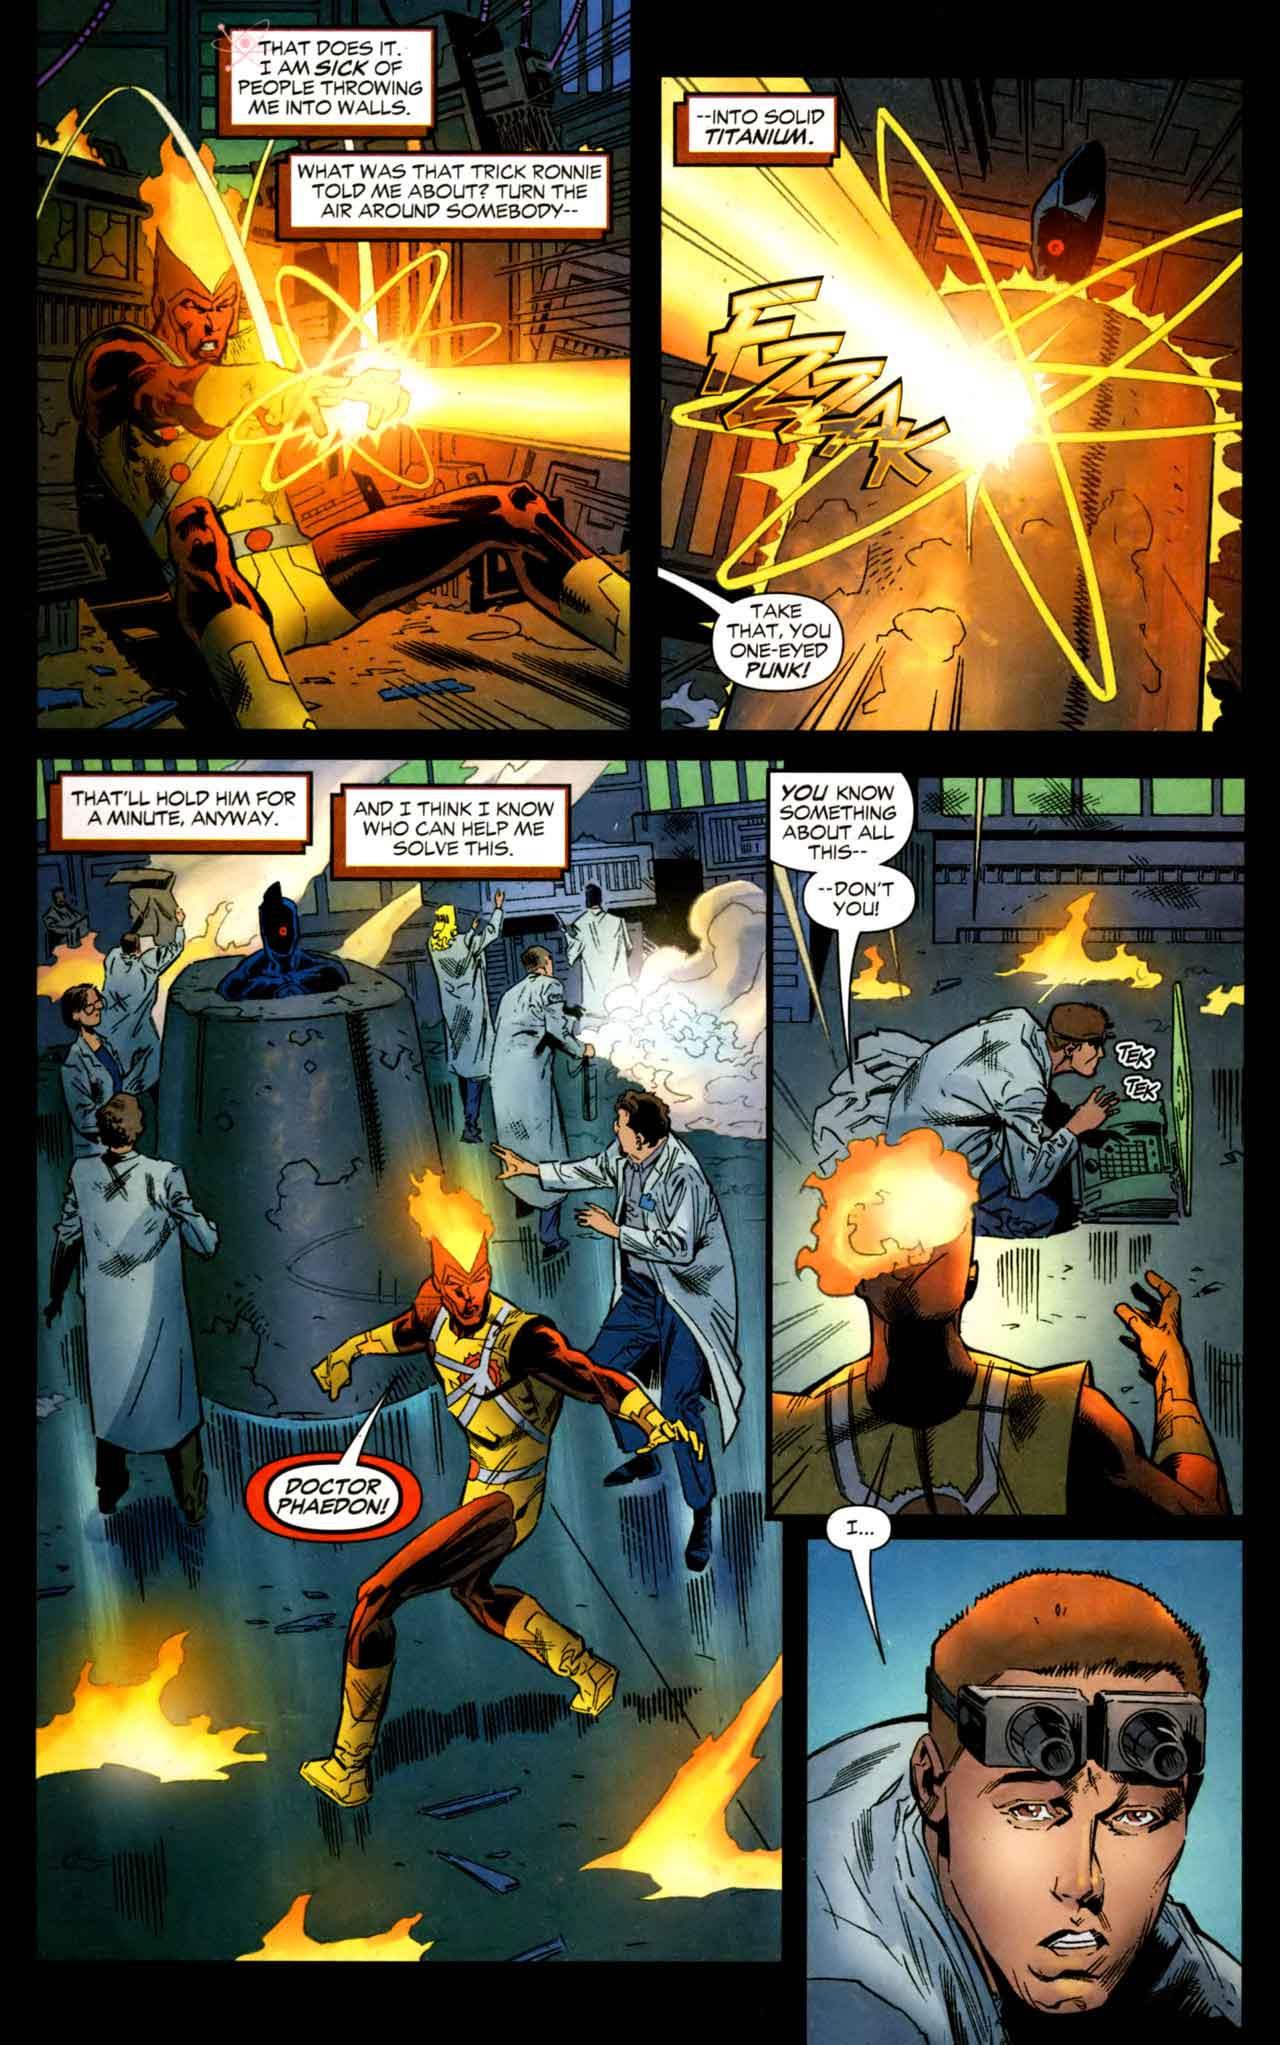 FIRESTORM #18 by Stuart Moore, Patrick Olliffe, Jamal Igle, Simon Coleby, and Rob Stull